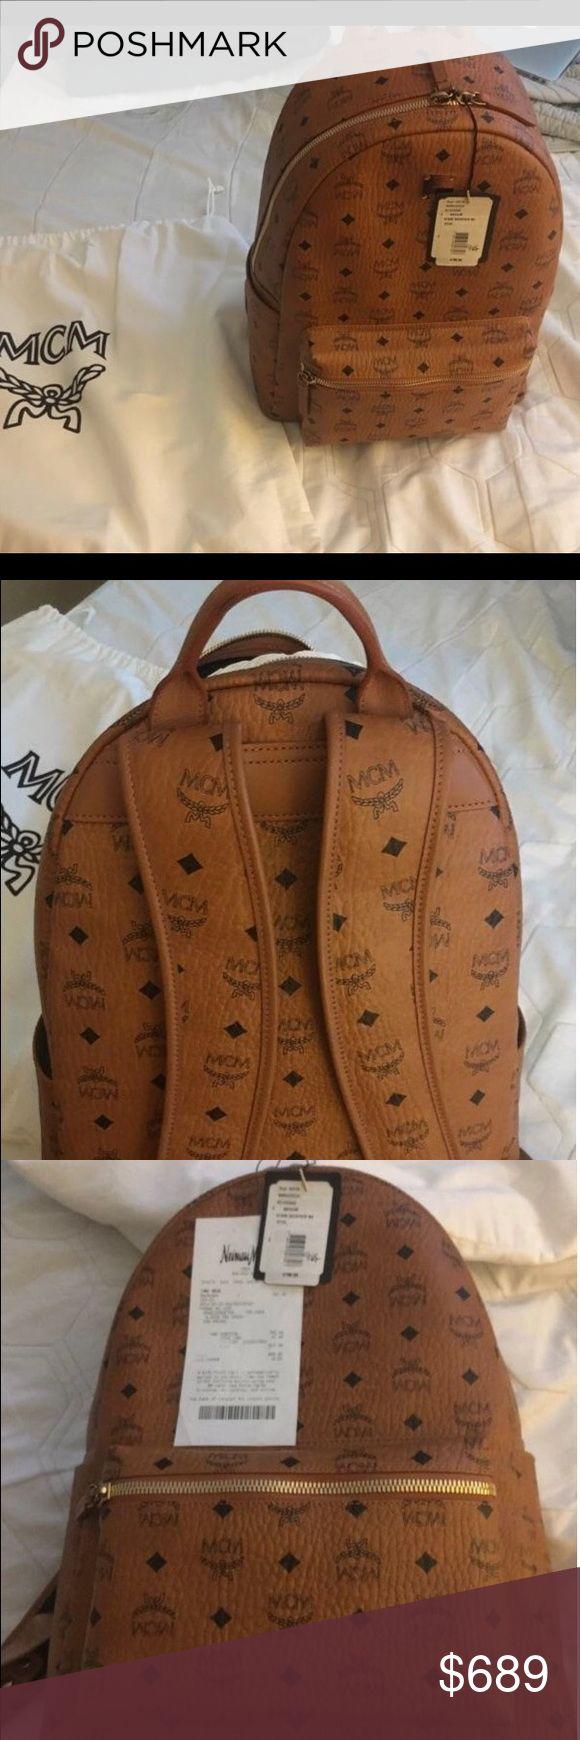 MCM BACKPACK Brand New MCM Backpack....dust bag included MCM Bags Backpacks